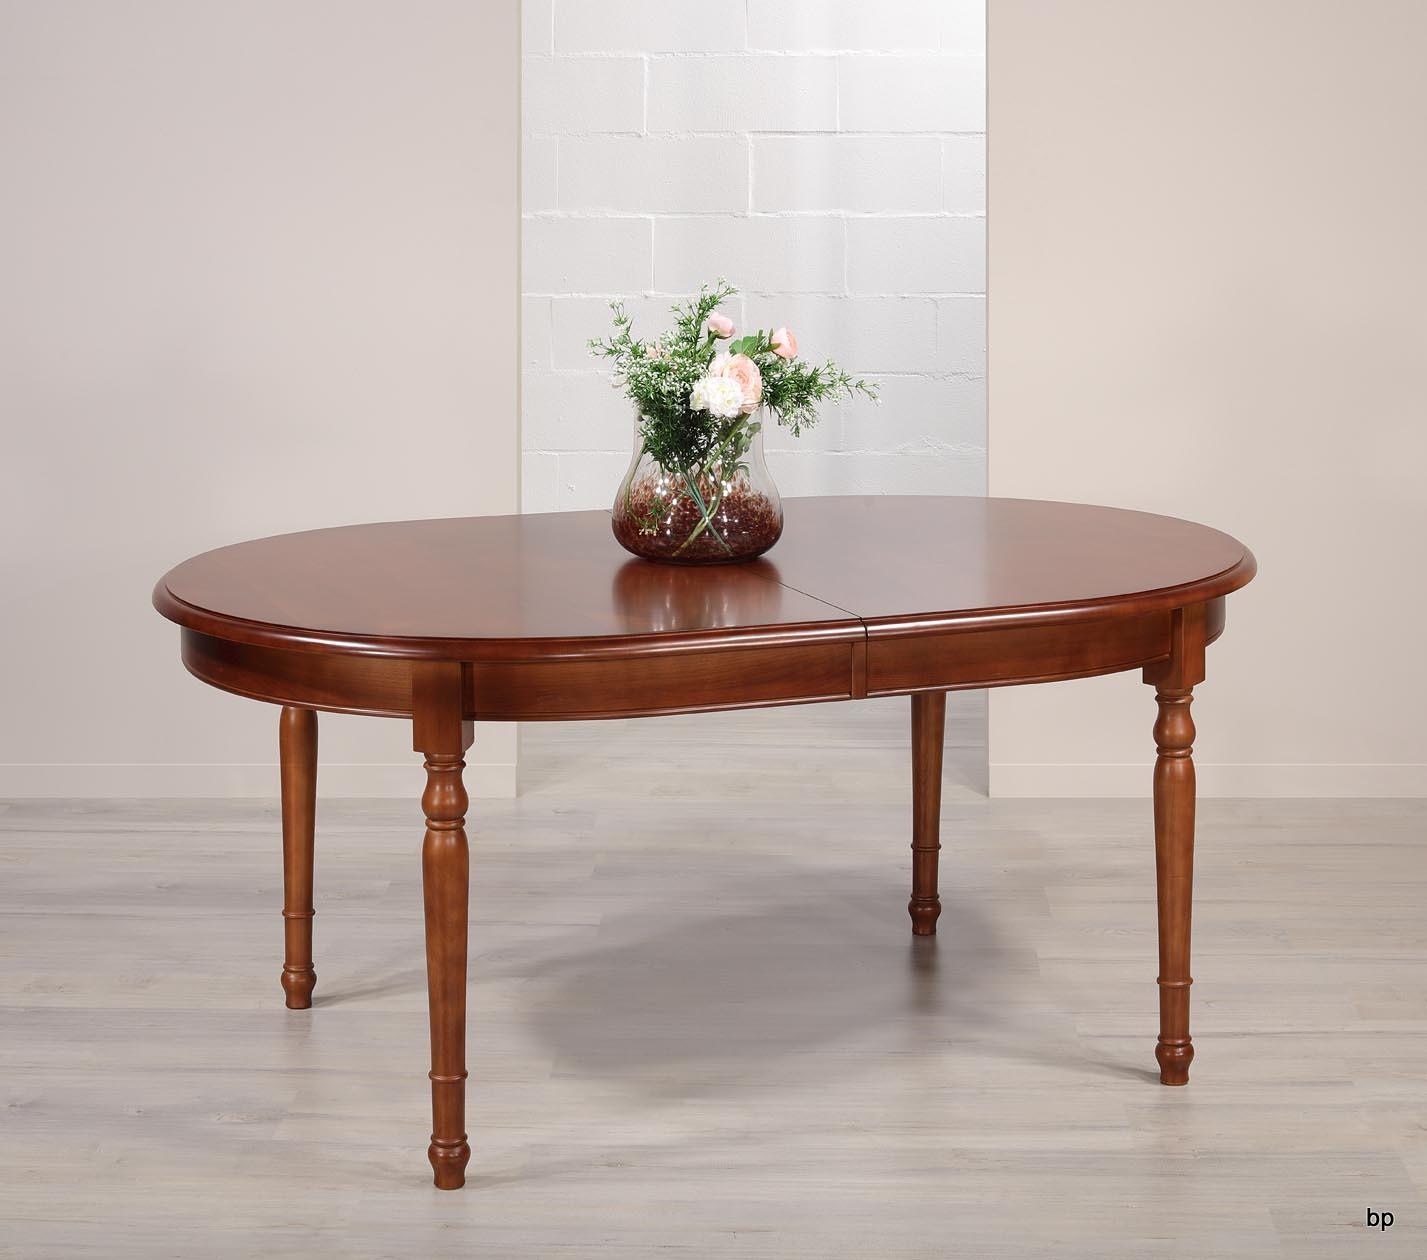 table ovale 170 110 en merisier massif de style louis. Black Bedroom Furniture Sets. Home Design Ideas